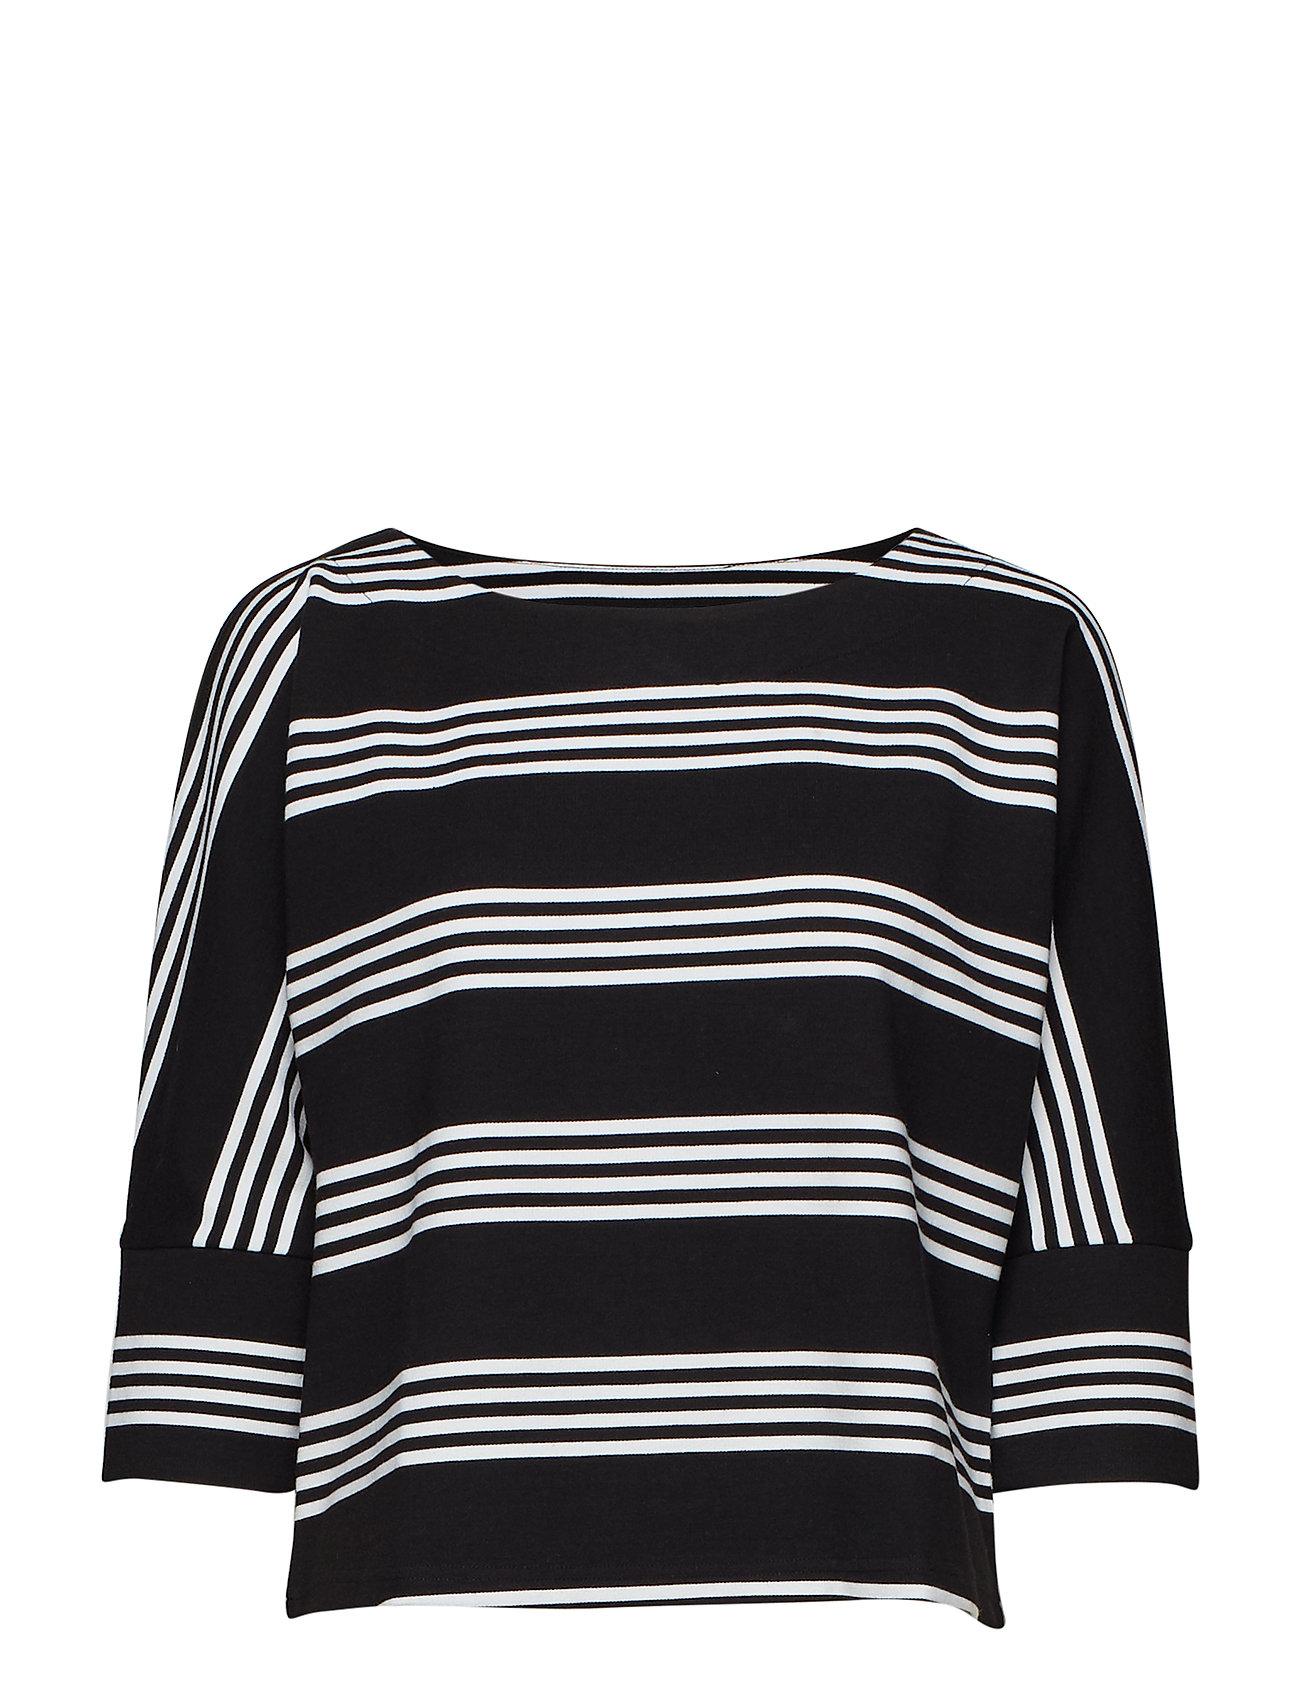 Nanso Ladies shirt, Kippari